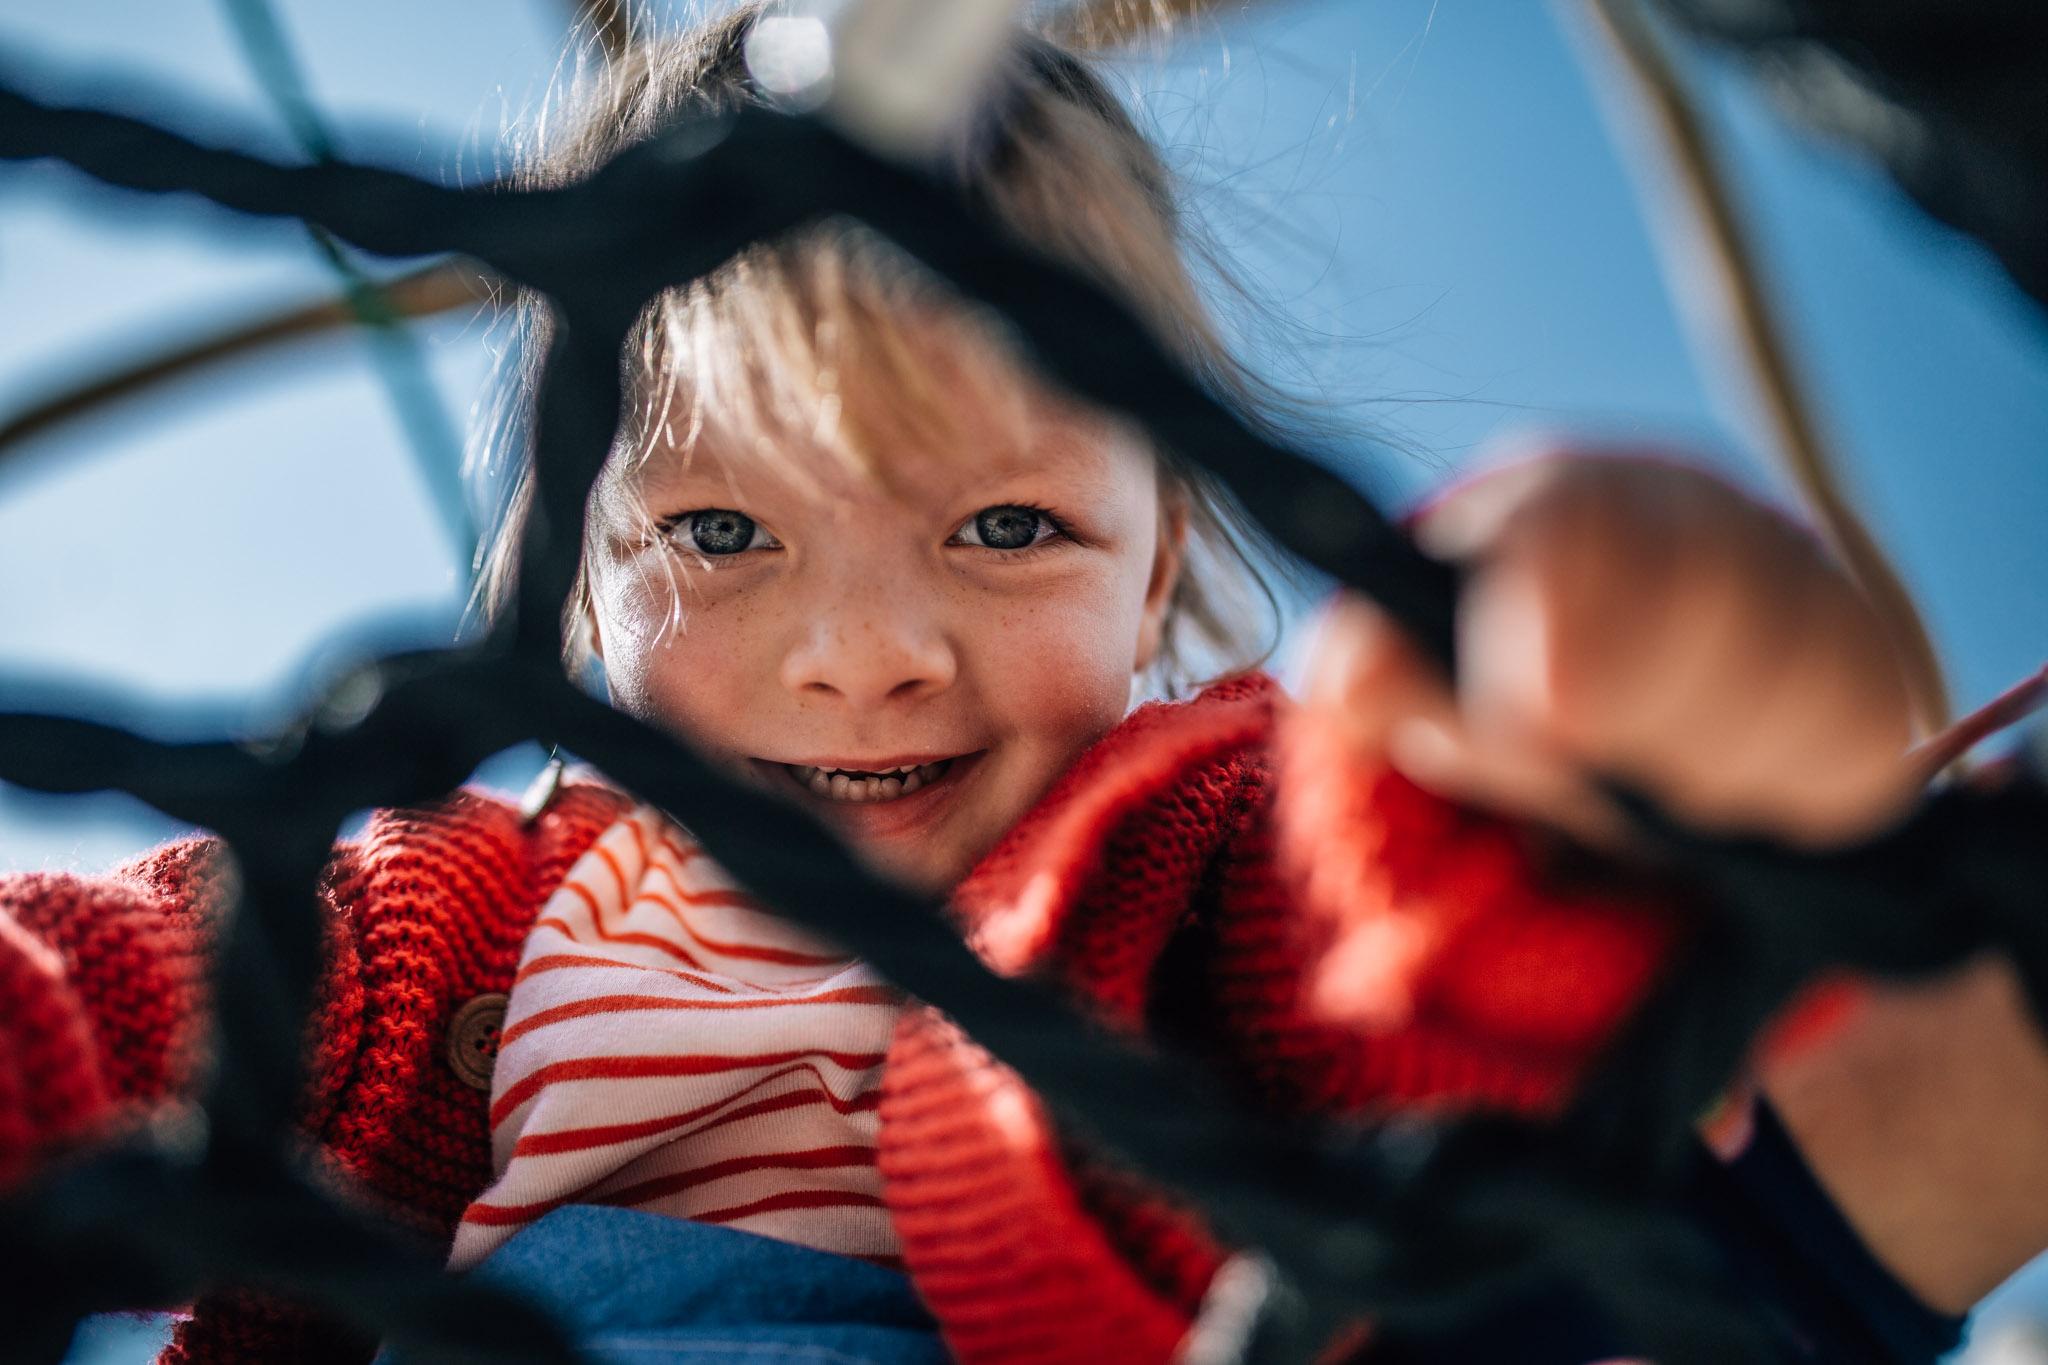 little girl in red cardigan climbing play equipment II (1 of 1).jpg